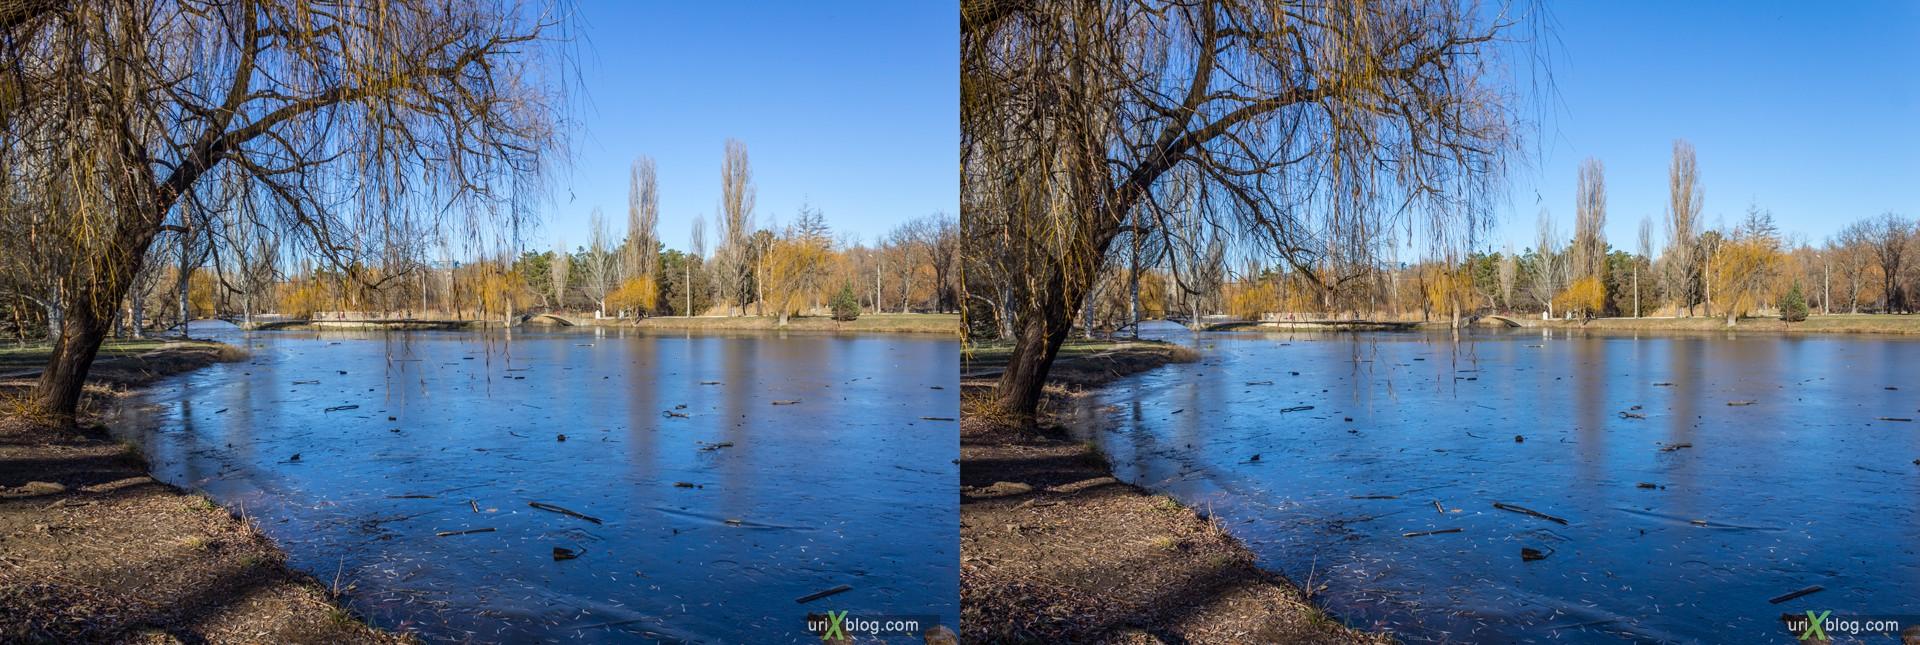 2012, Simferopol, Gagarin park, Crimea, Russia, Ukraine, winter, 3D, stereo pair, cross-eyed, crossview, cross view stereo pair, stereoscopic